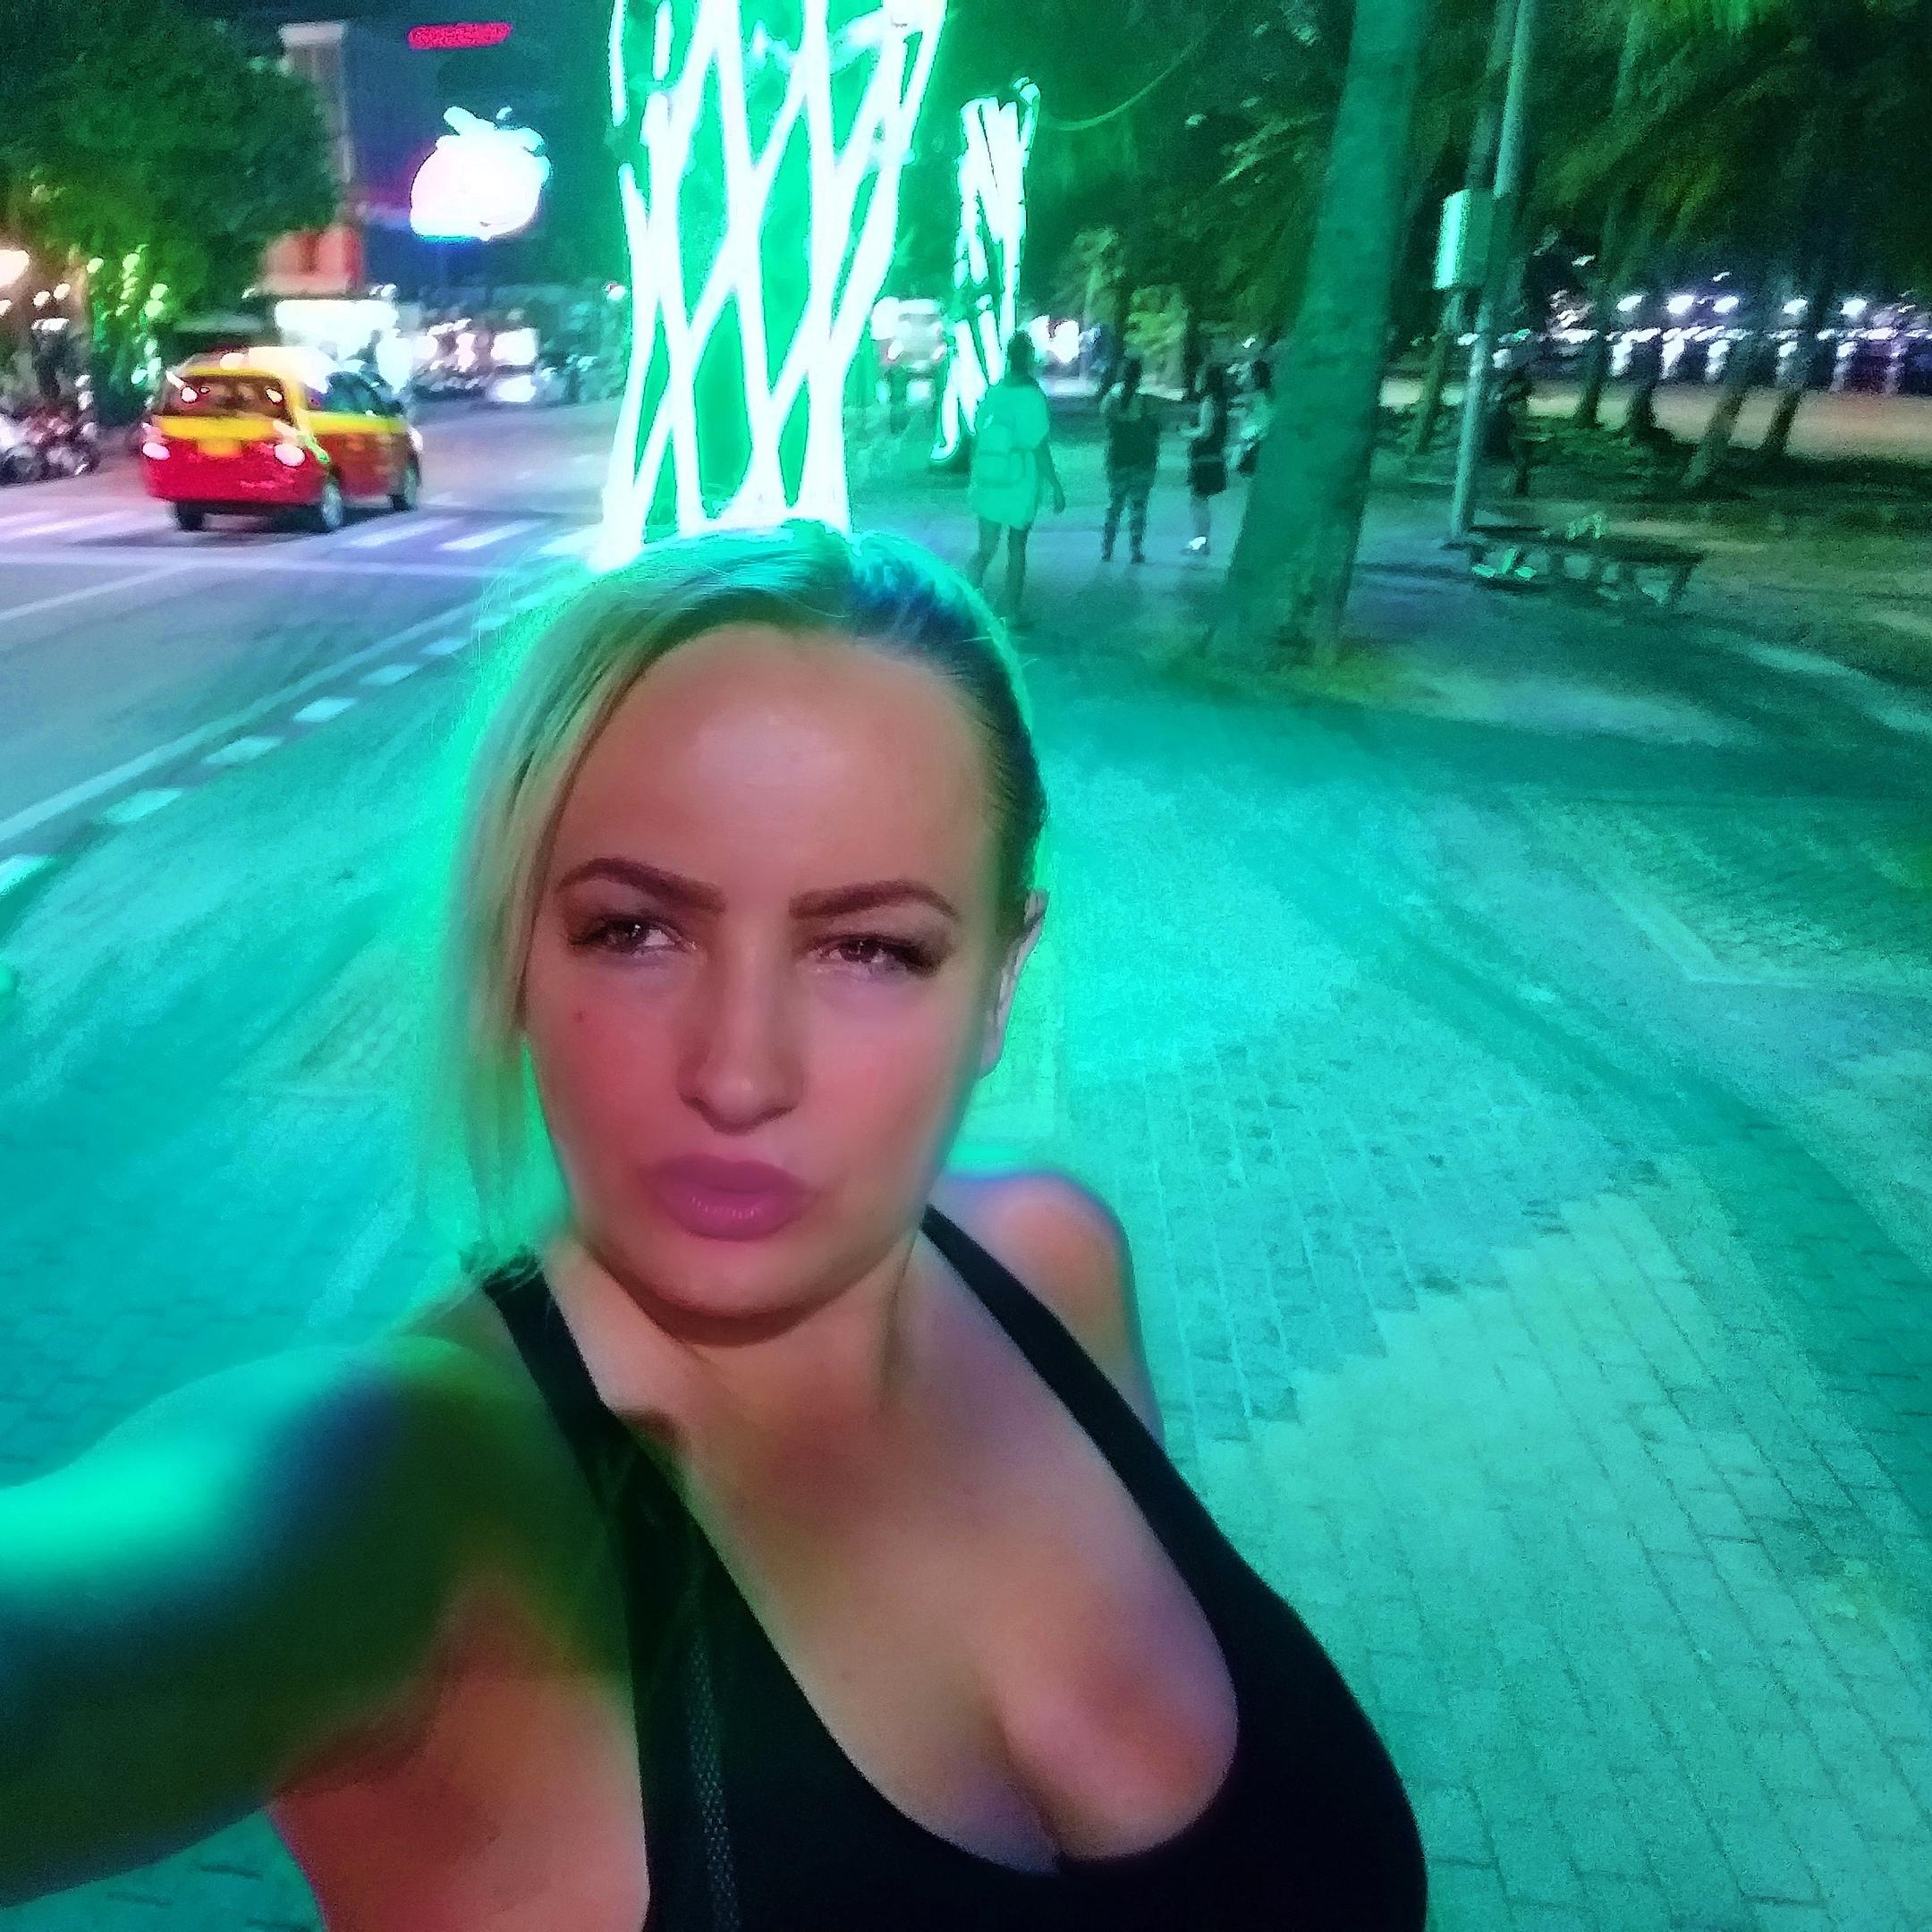 Елена Руденко (Валтея). Мои путешествия. Таиланд ( 2019 г. осень) ФОТО. CLhxCeSLhMs